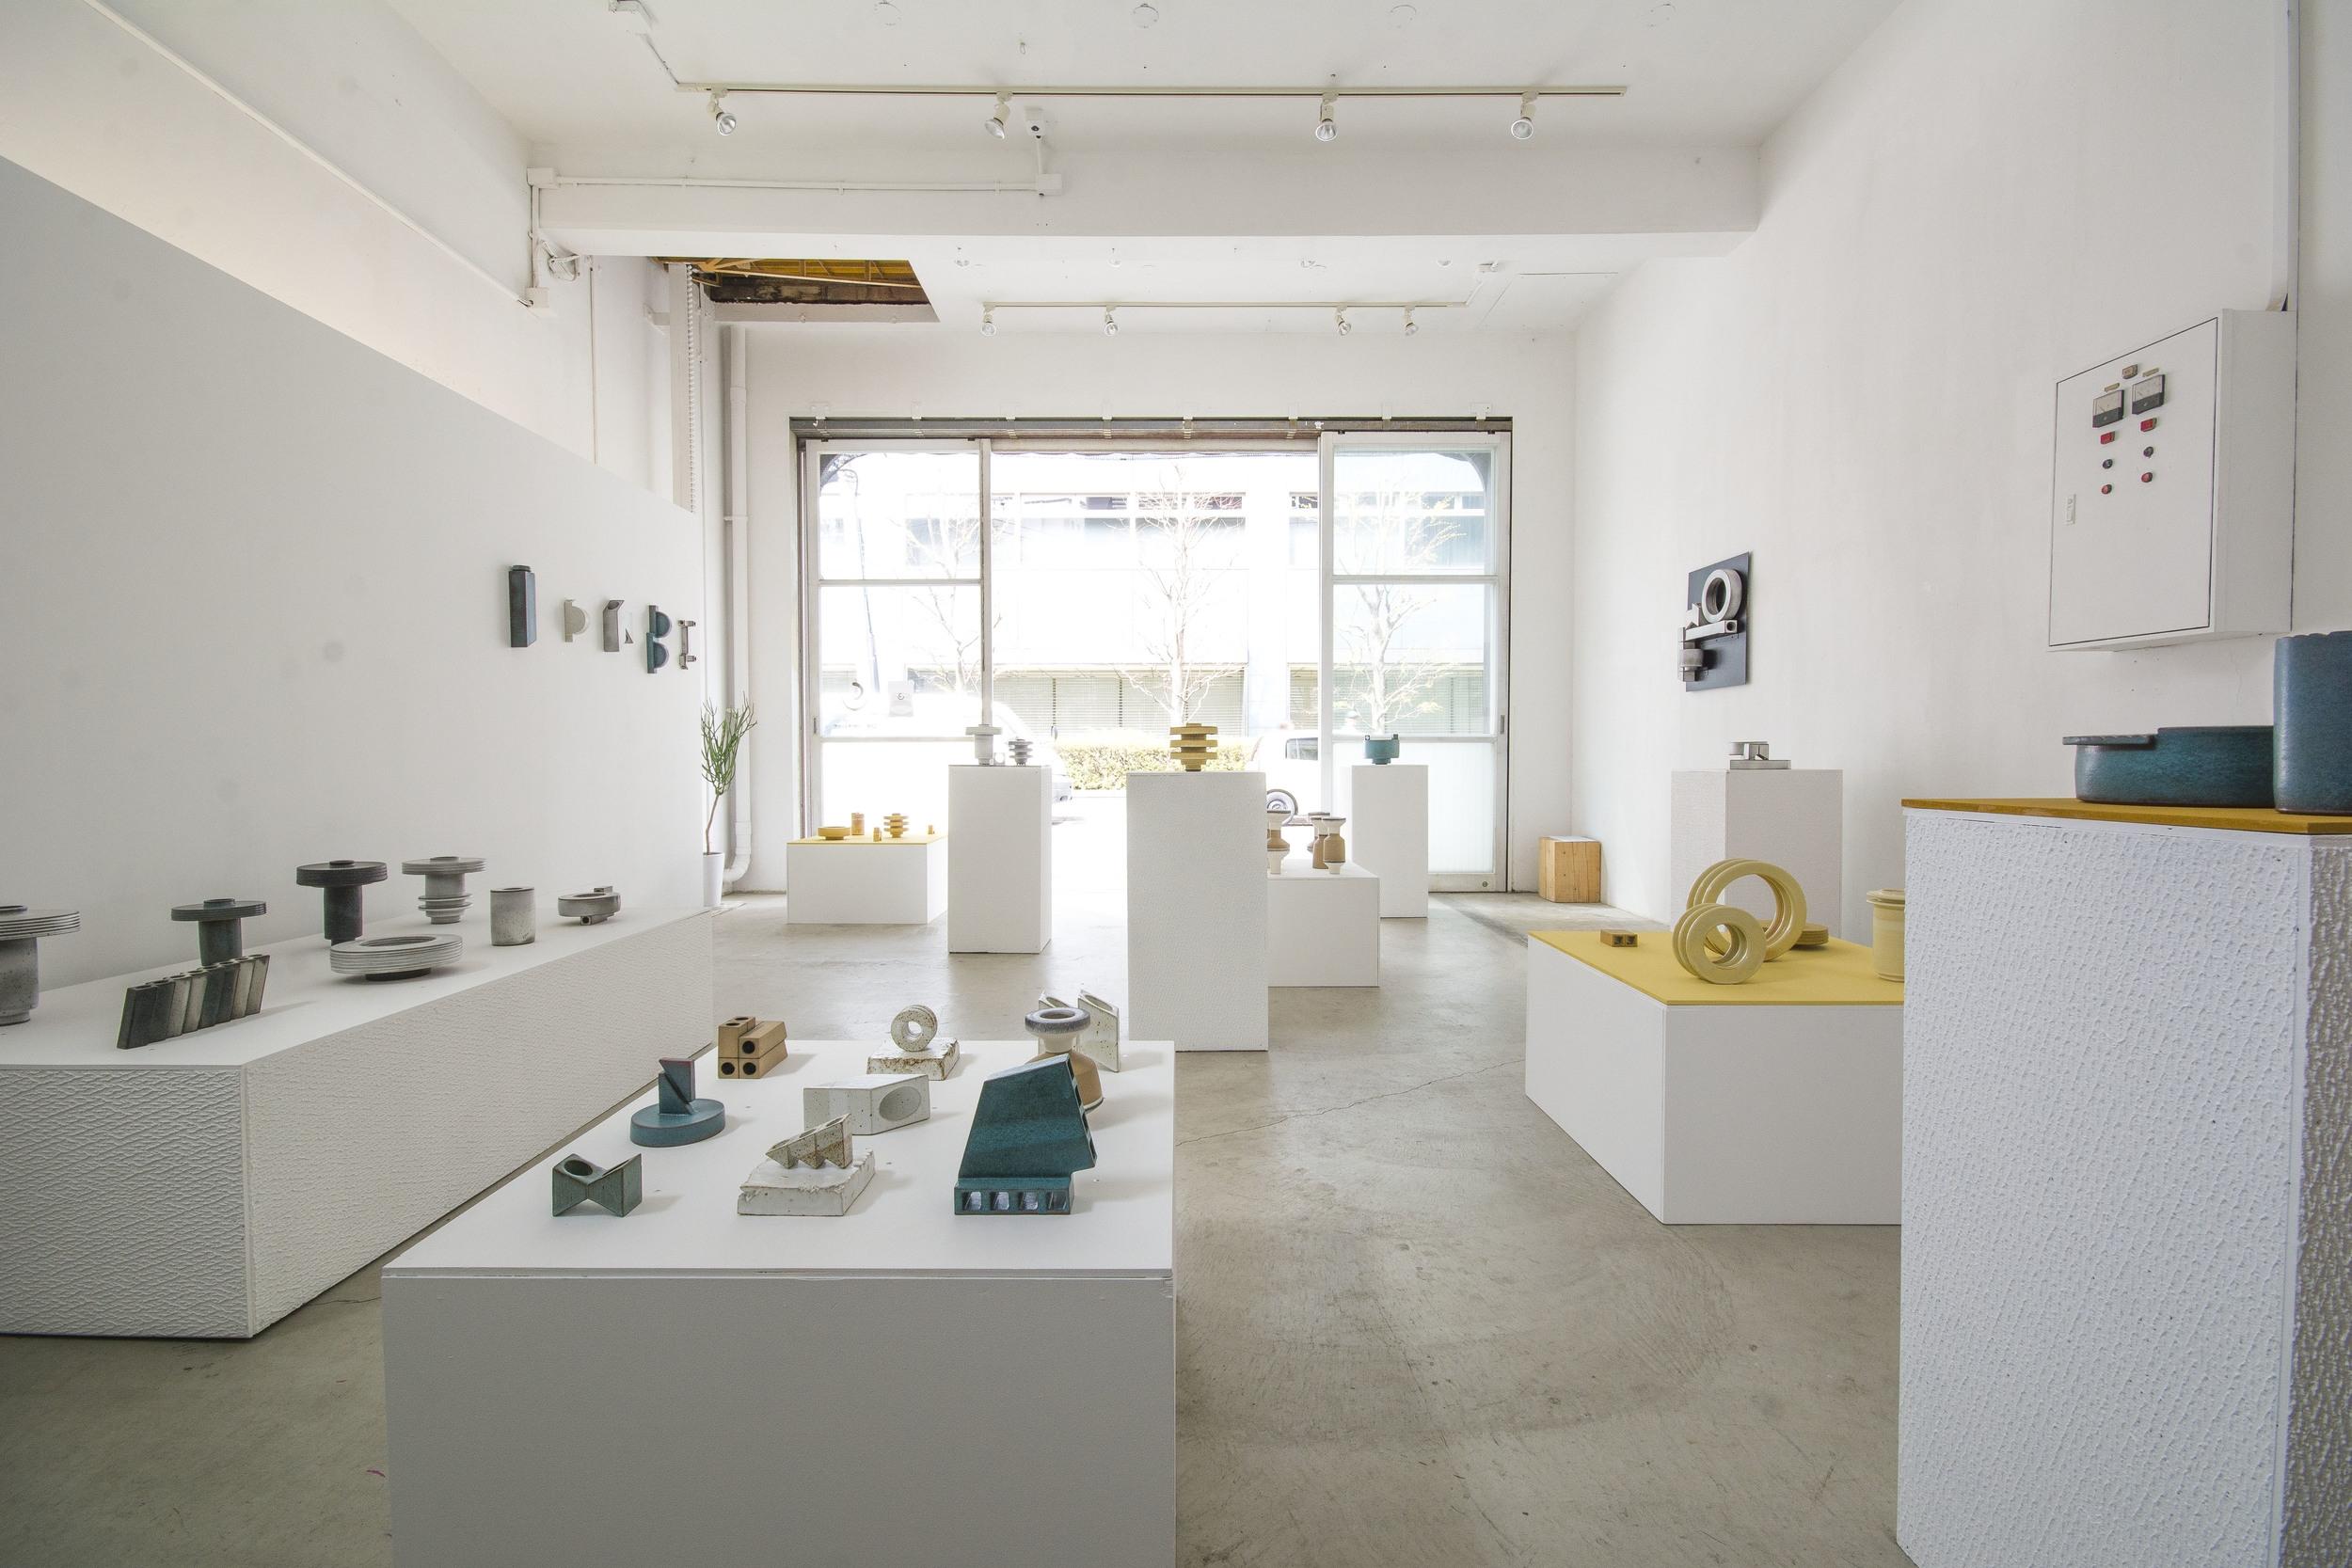 Installation View, Curators Cube